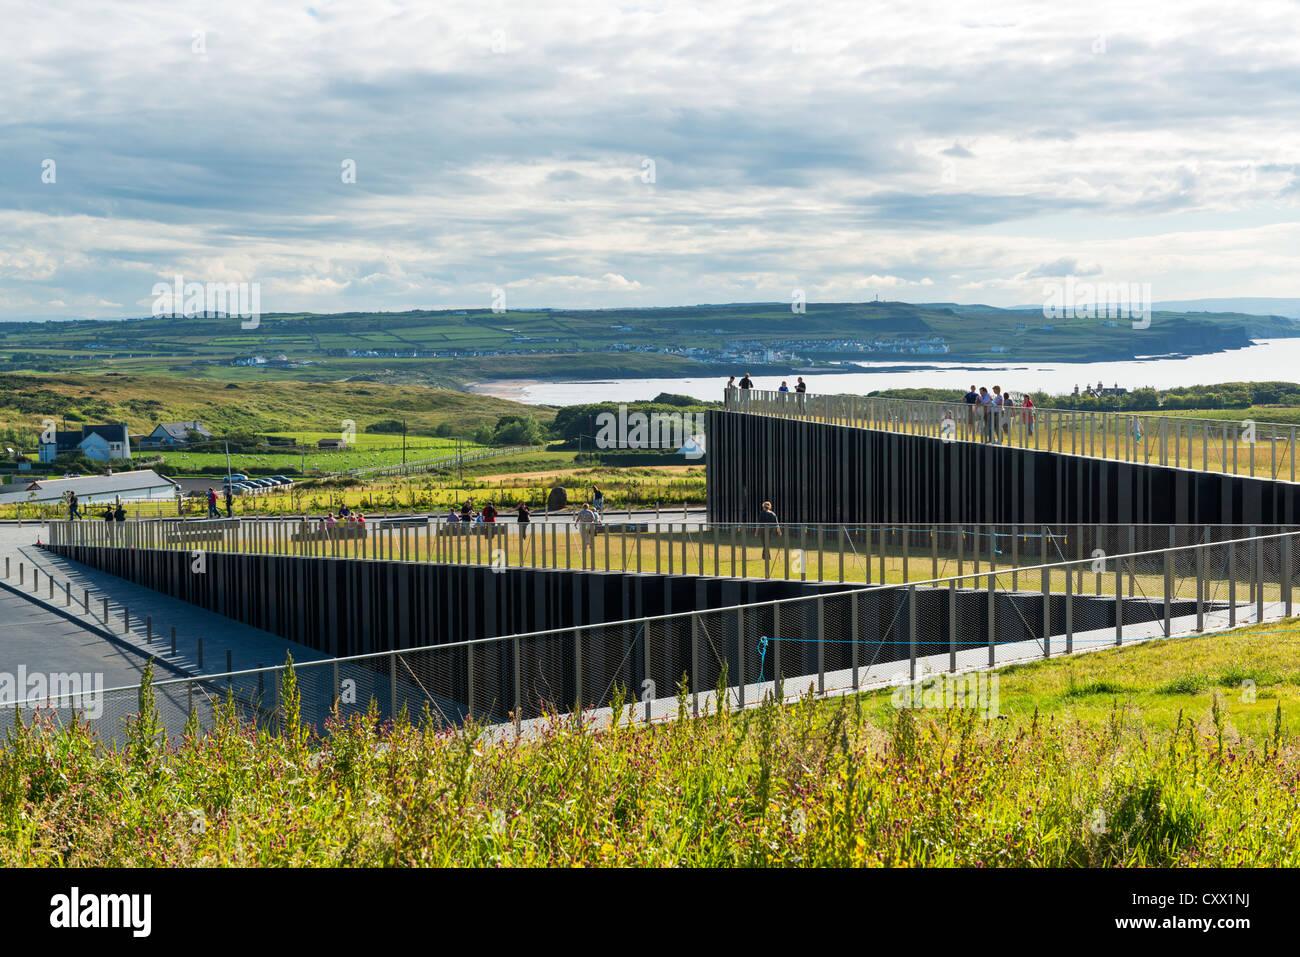 Giant's Causeway, County Antrim, Northern Ireland - Stock Image